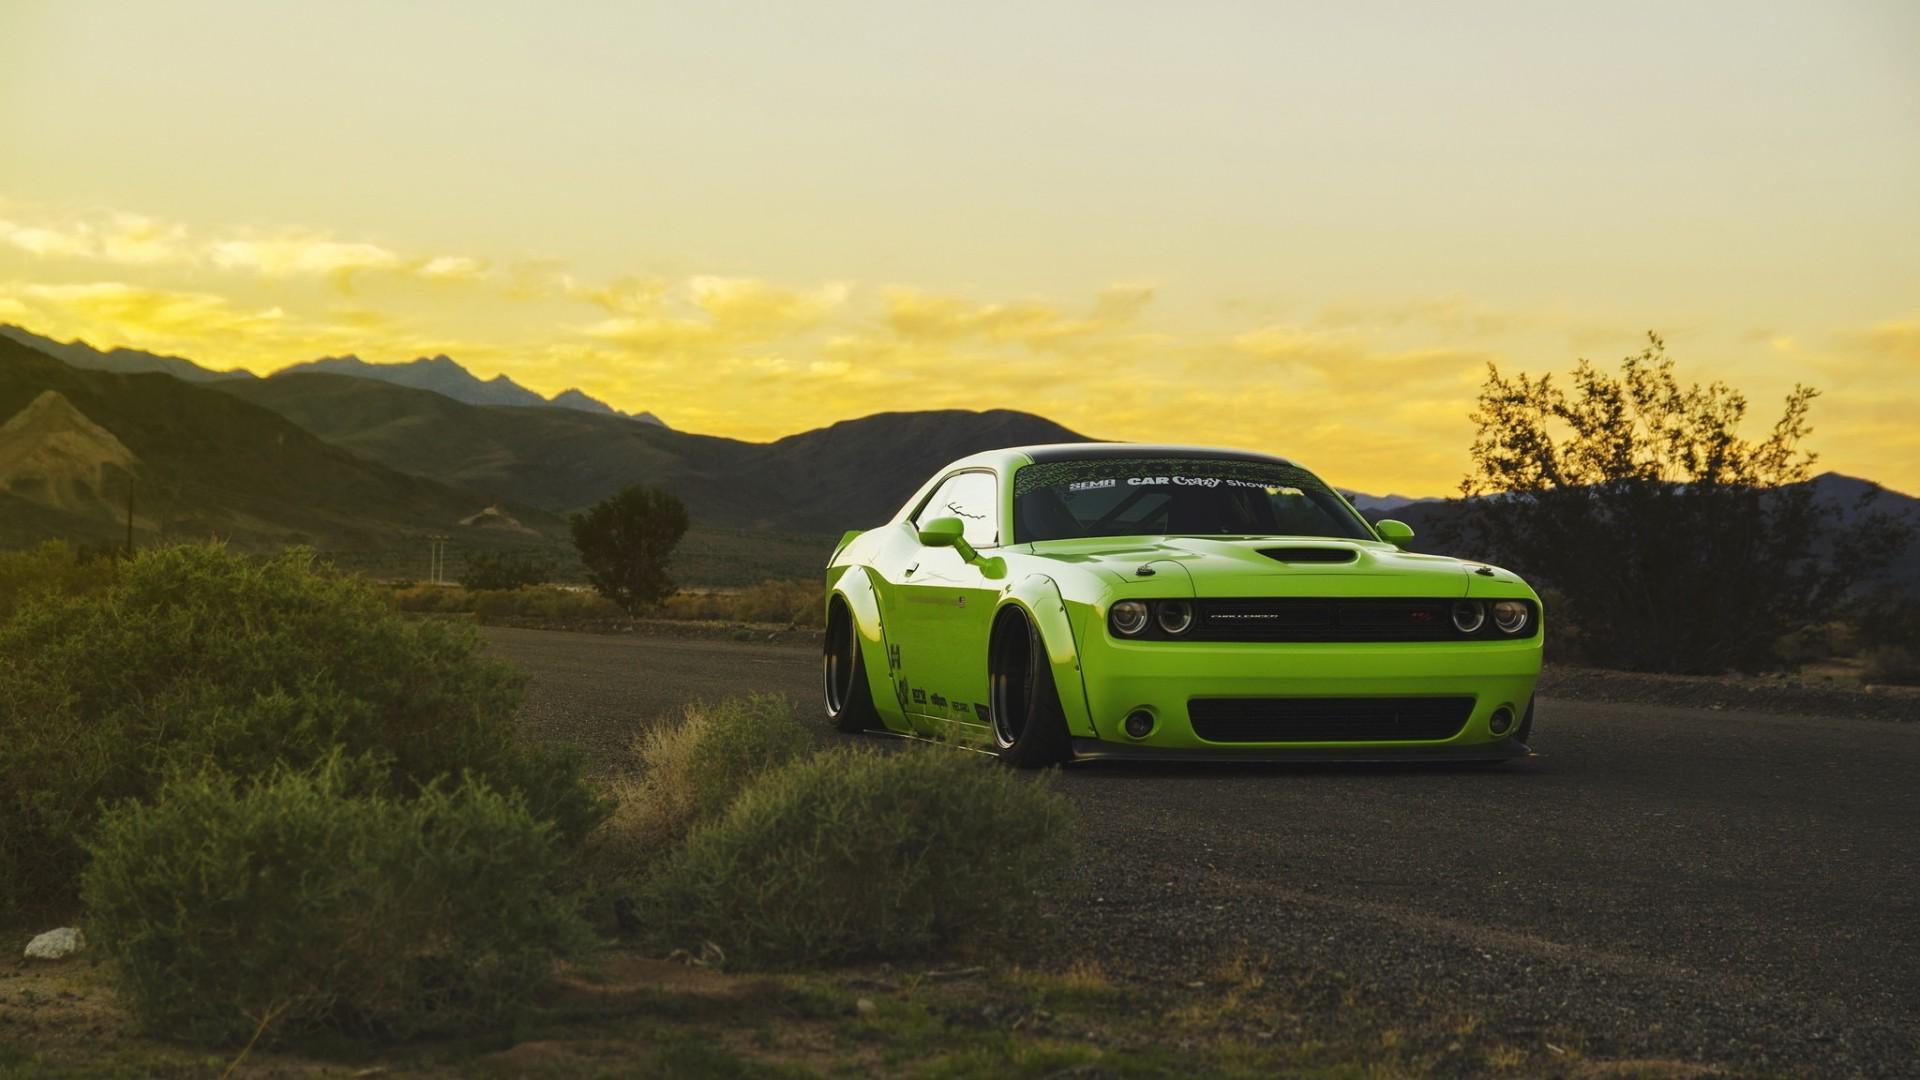 Dodge challenger green hd cars 4k wallpapers images - Dodge car 4k wallpaper ...